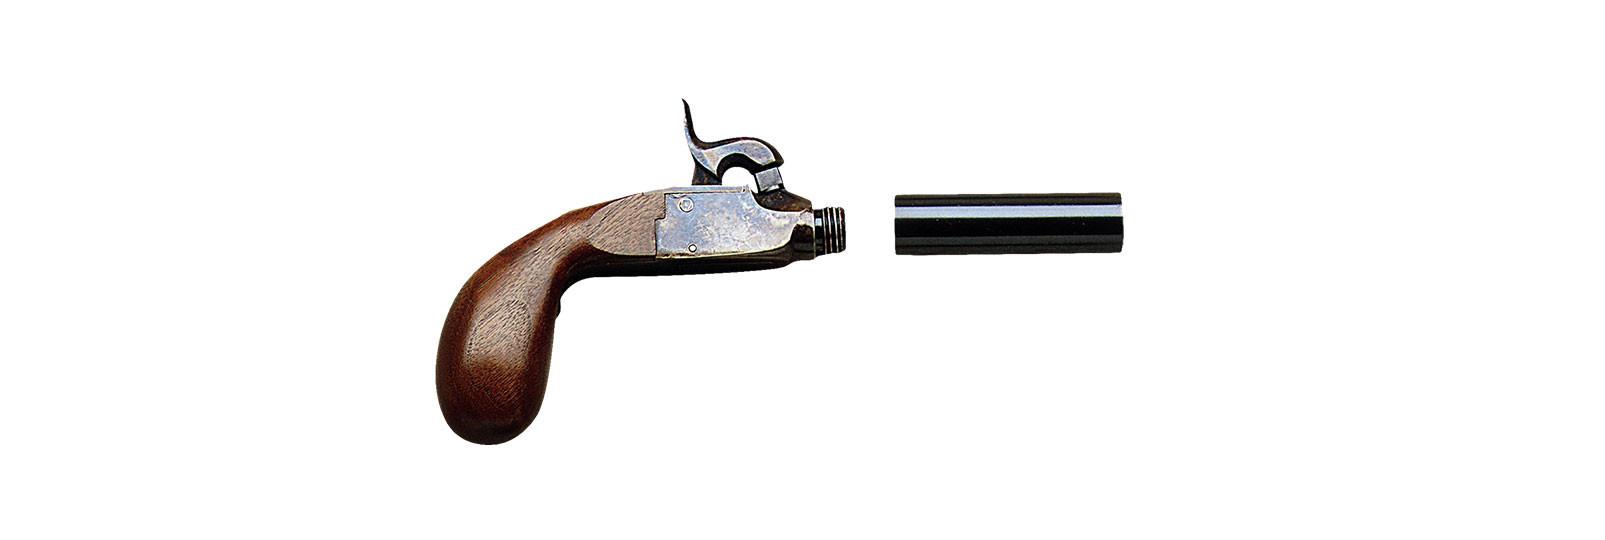 Derringer Liegi Pistol